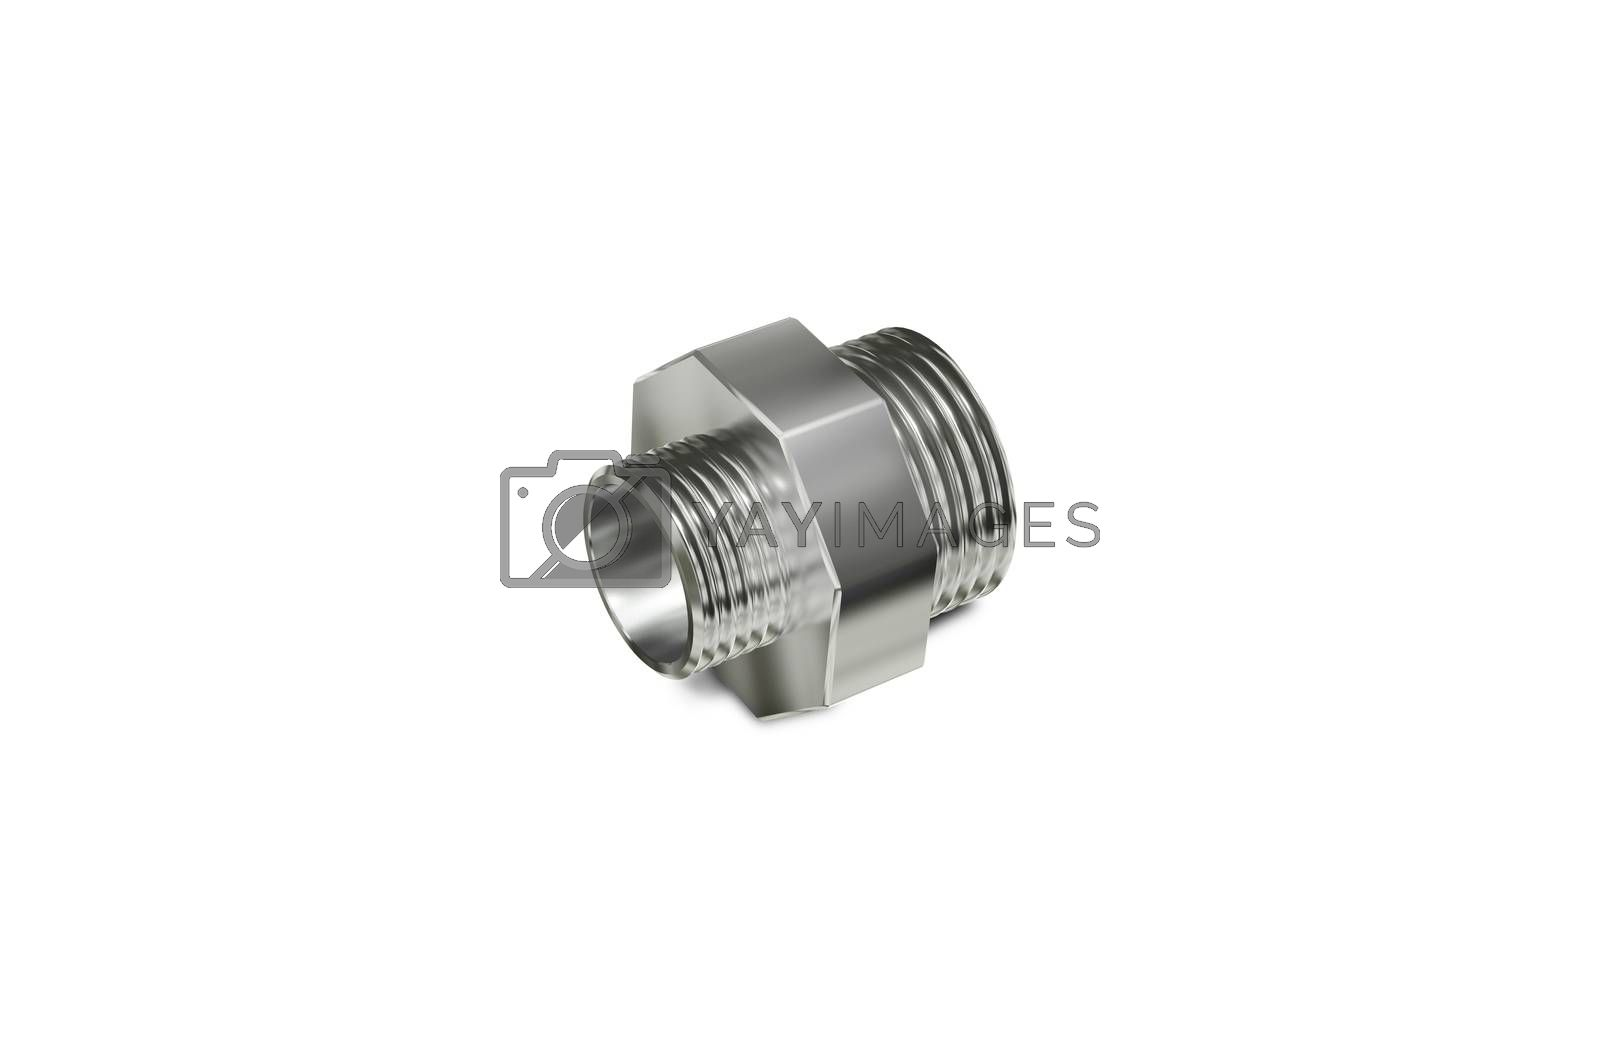 3d illustration Metallic Chrome Plated Industrial Part